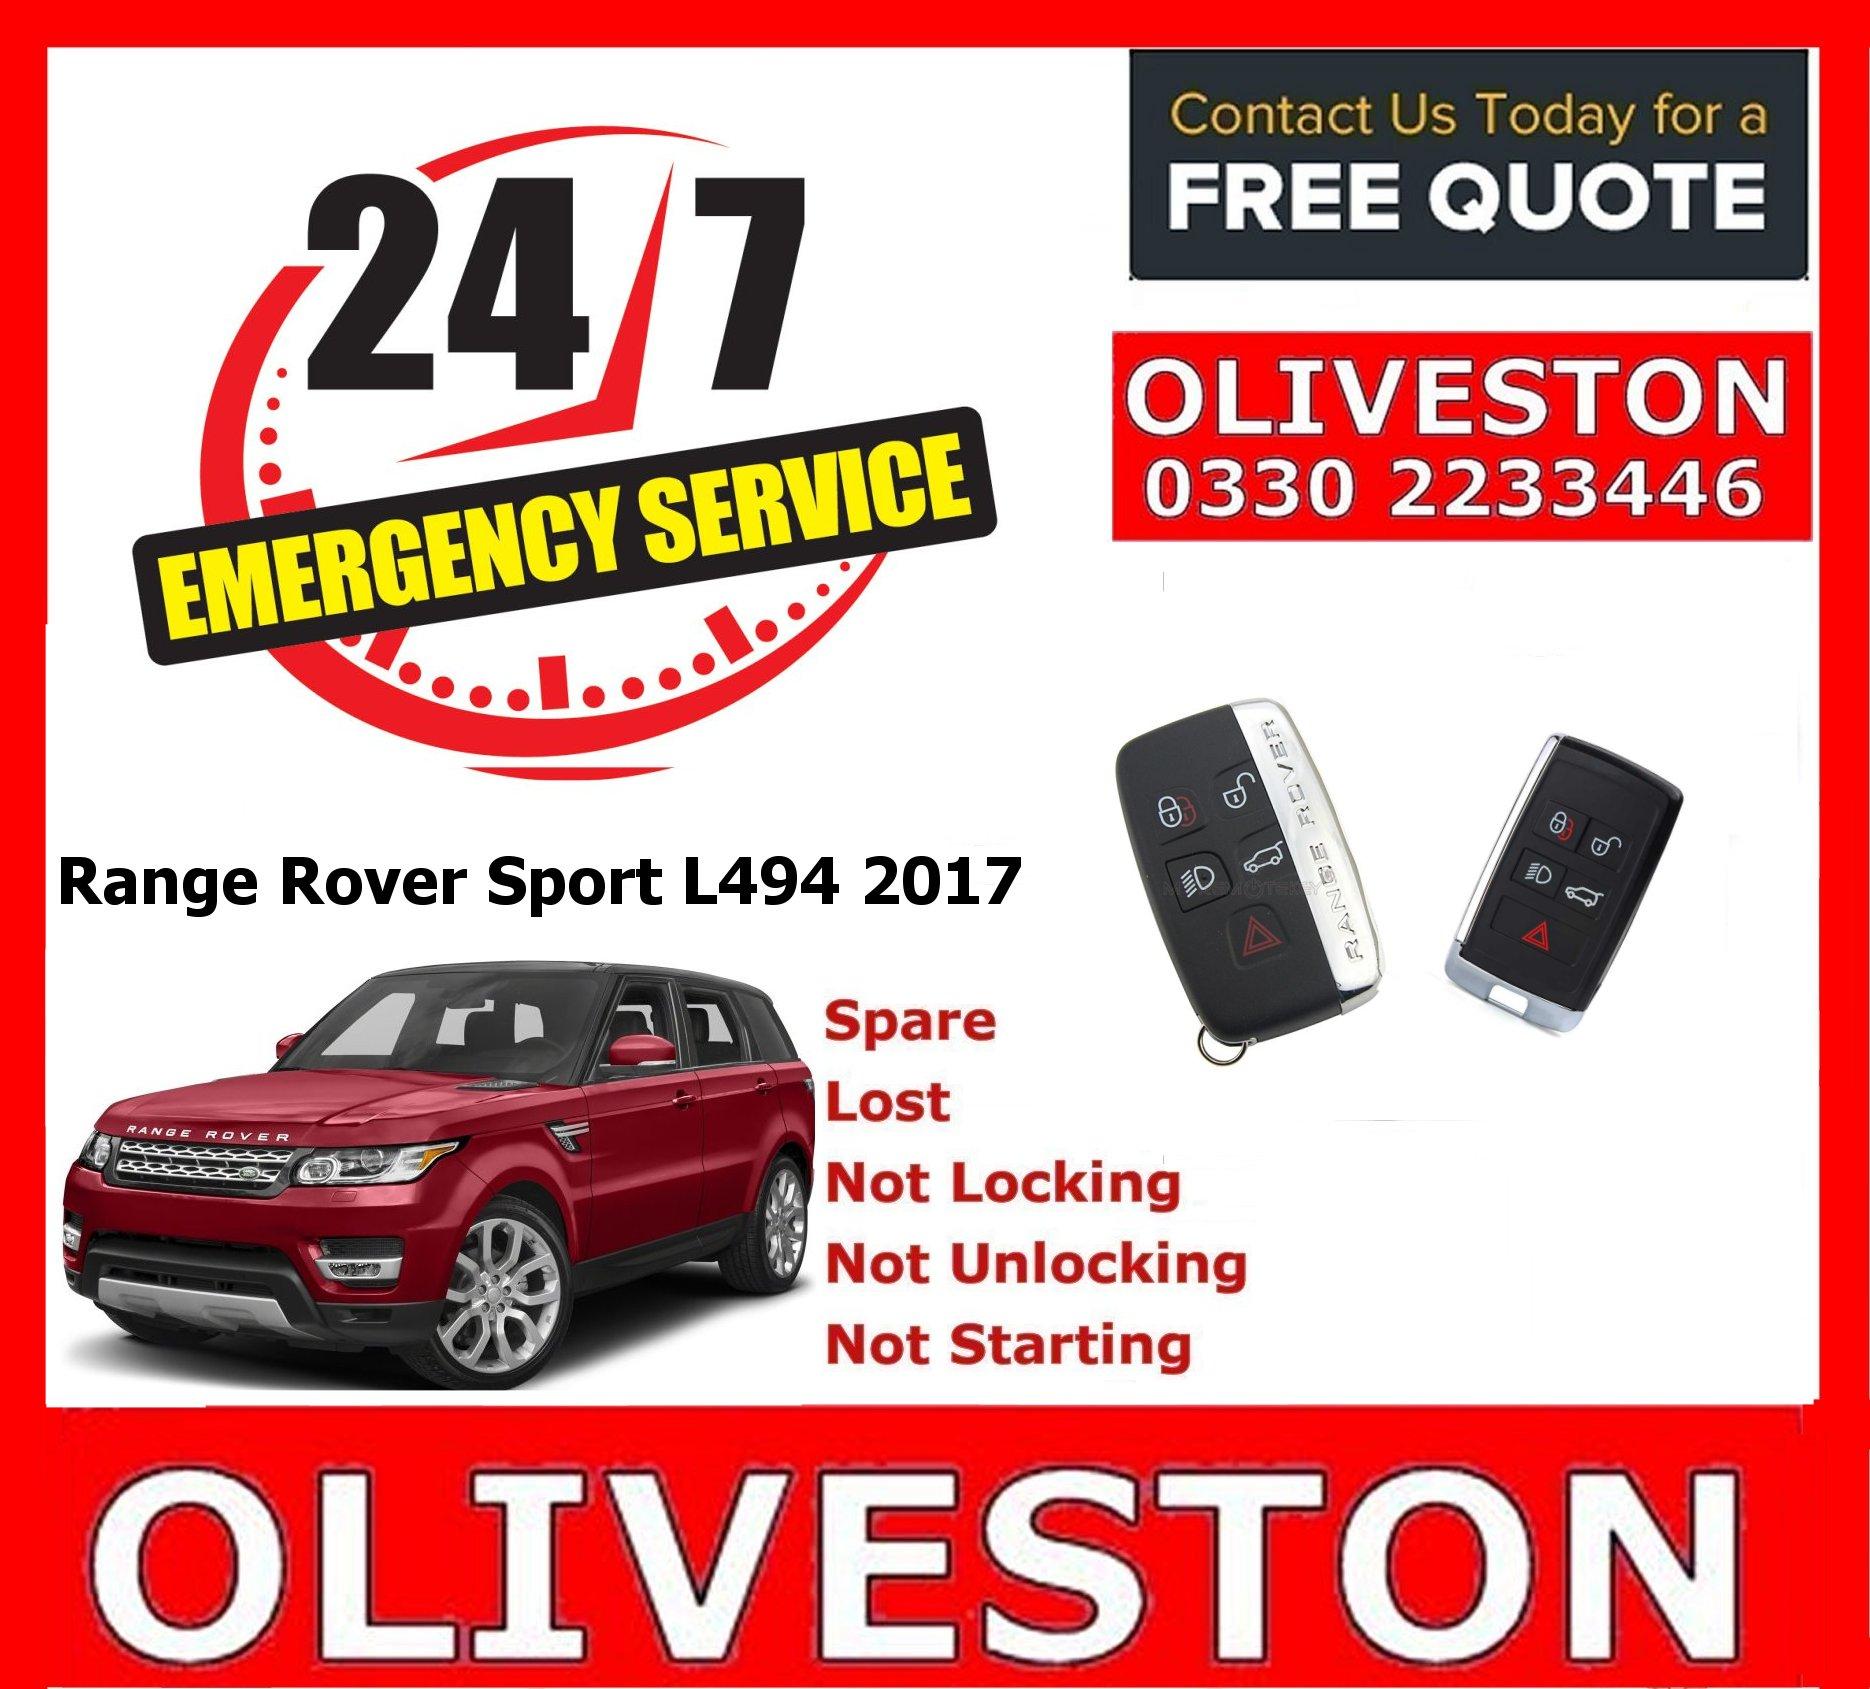 Range Rover Land Rover Jaguar Spare lost keys Bangor Newtownards Banbridge Dundonald Holywood Downpatrick Comber